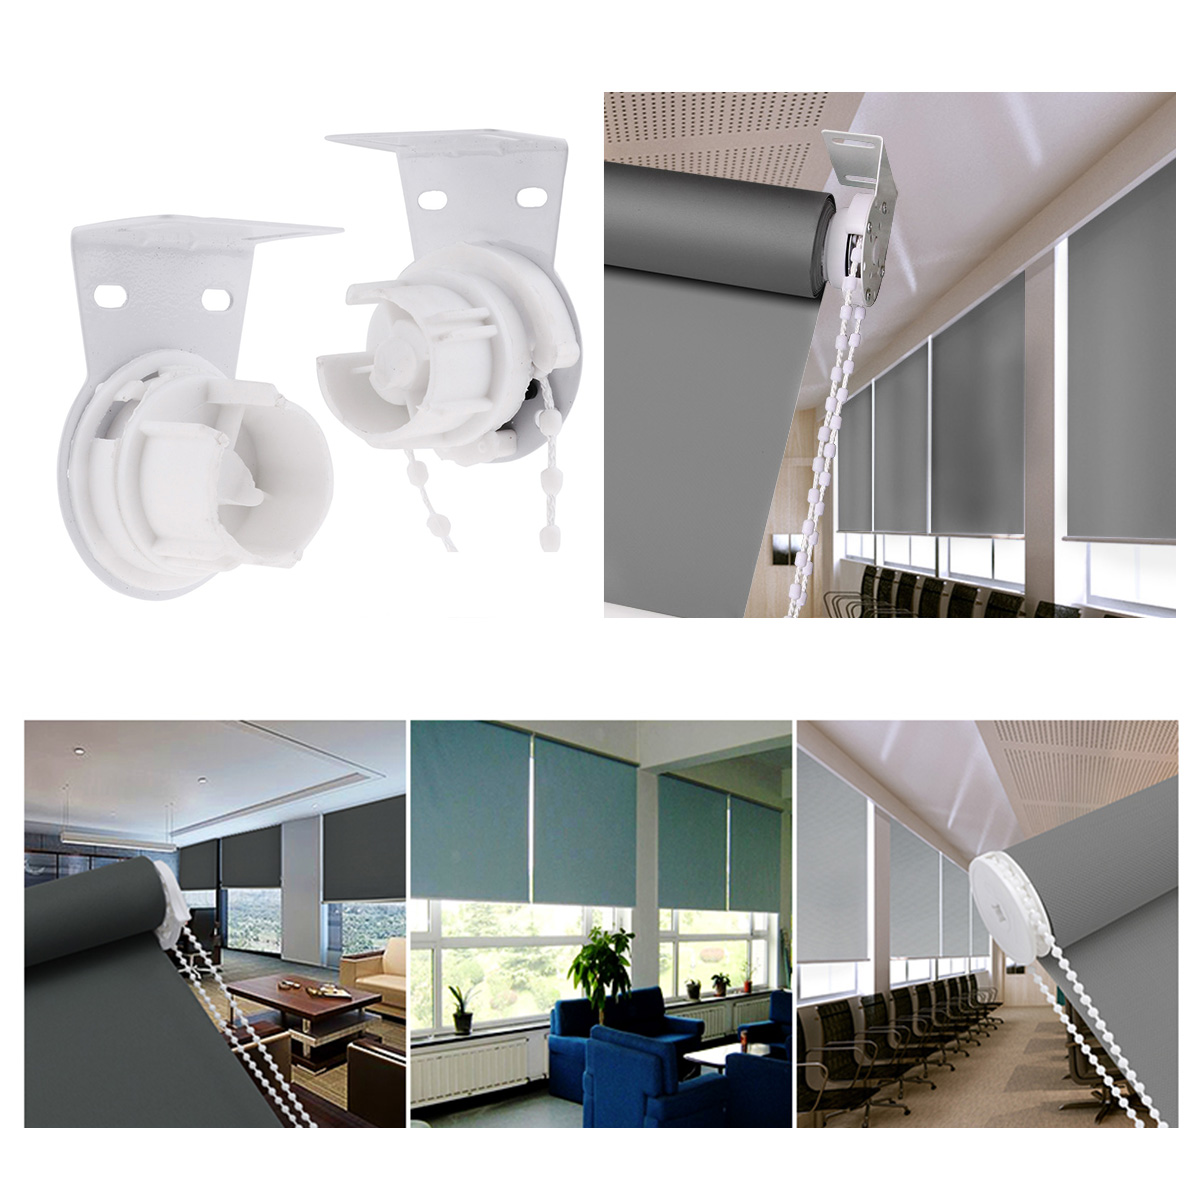 Curtain Roller Blind Shade Metal Core Clutch Bracket Cord